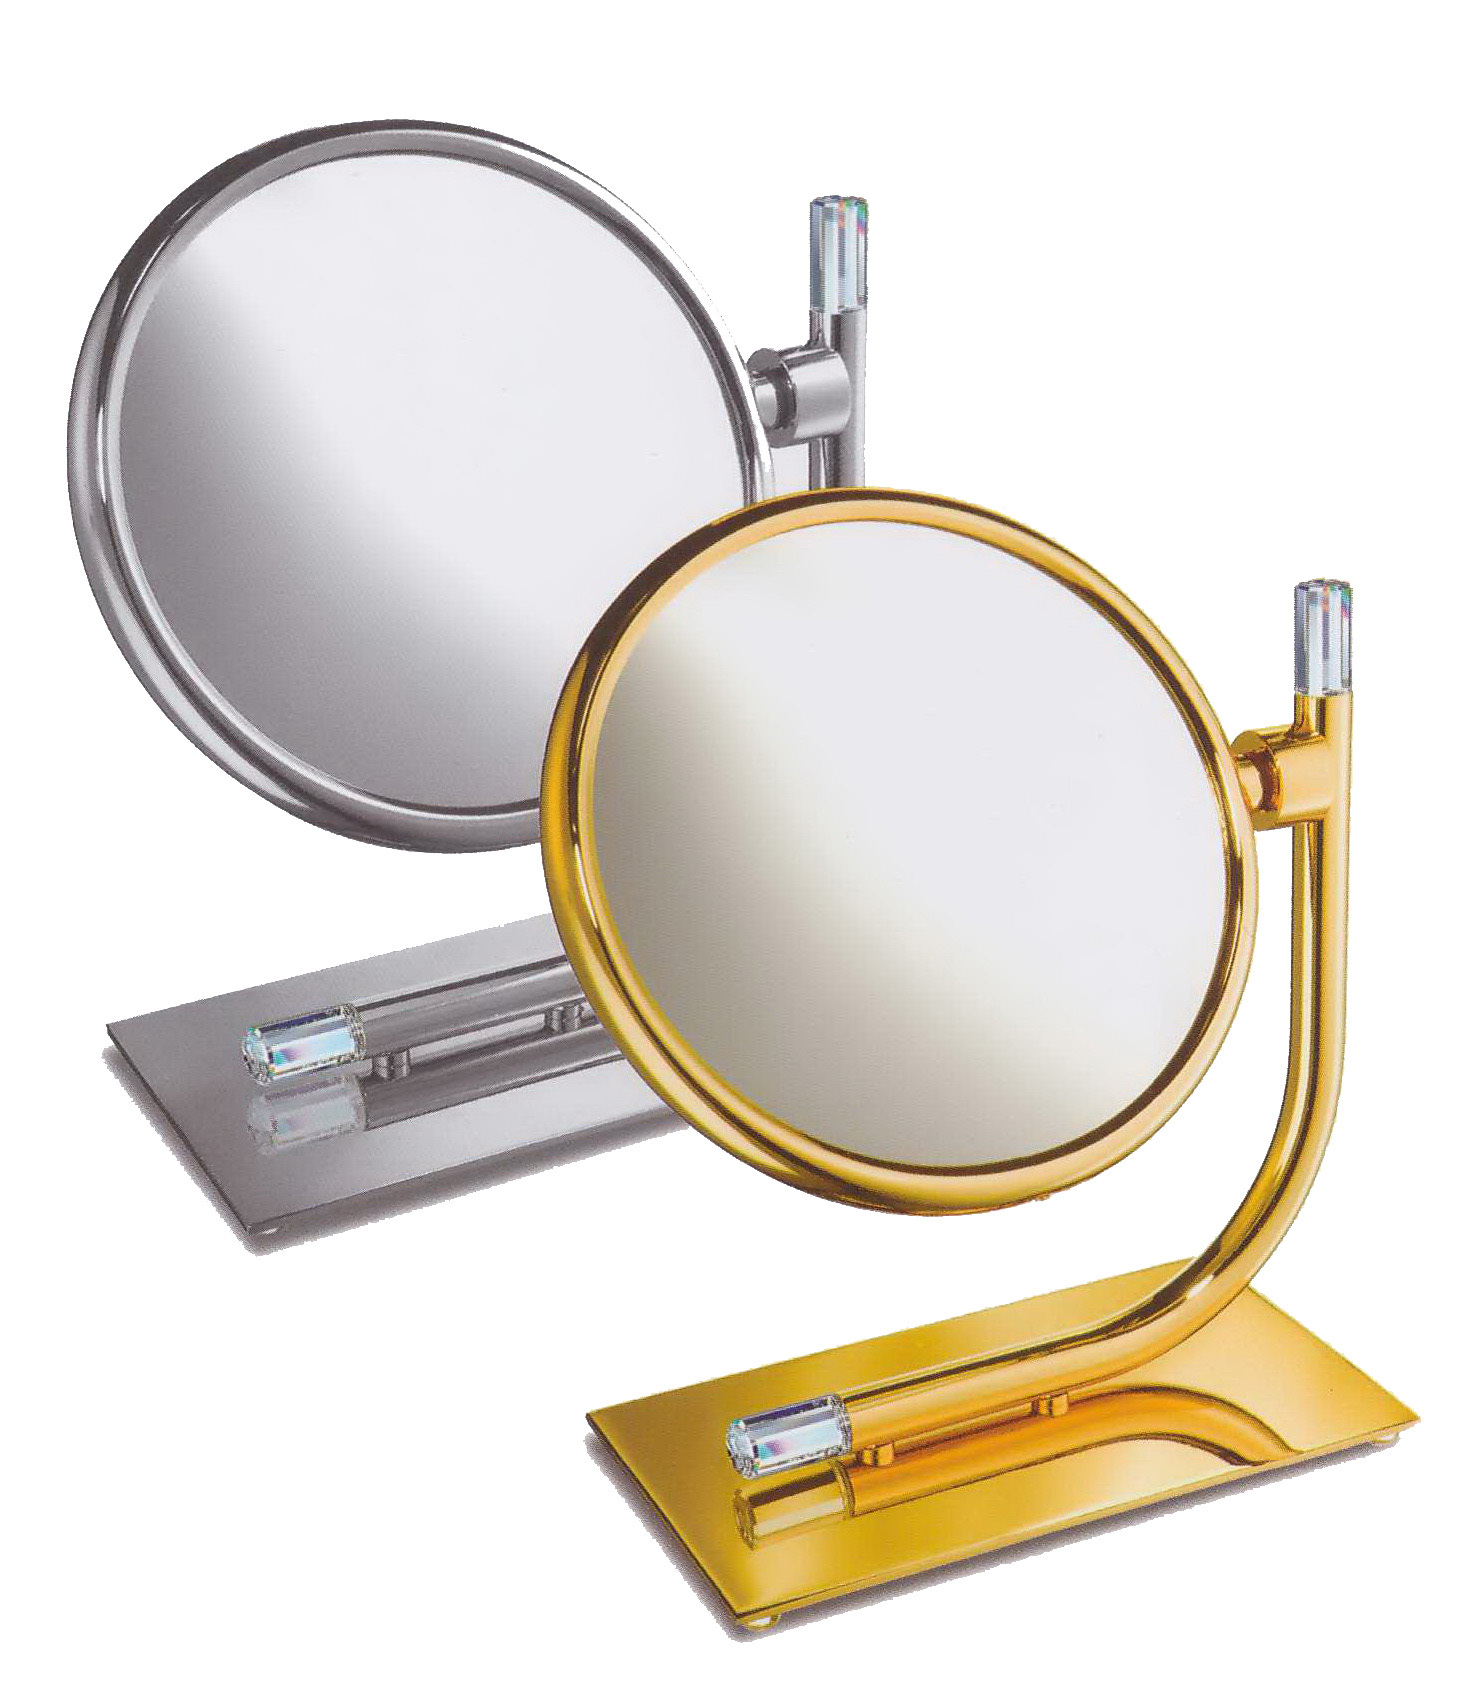 Зеркала Зеркало косметическое Windisch 99636O 3X Concept elitnoe-zerkalo-kosmeticheskoe-99636o-3x-concept-ot-windisch-ispaniya.jpg